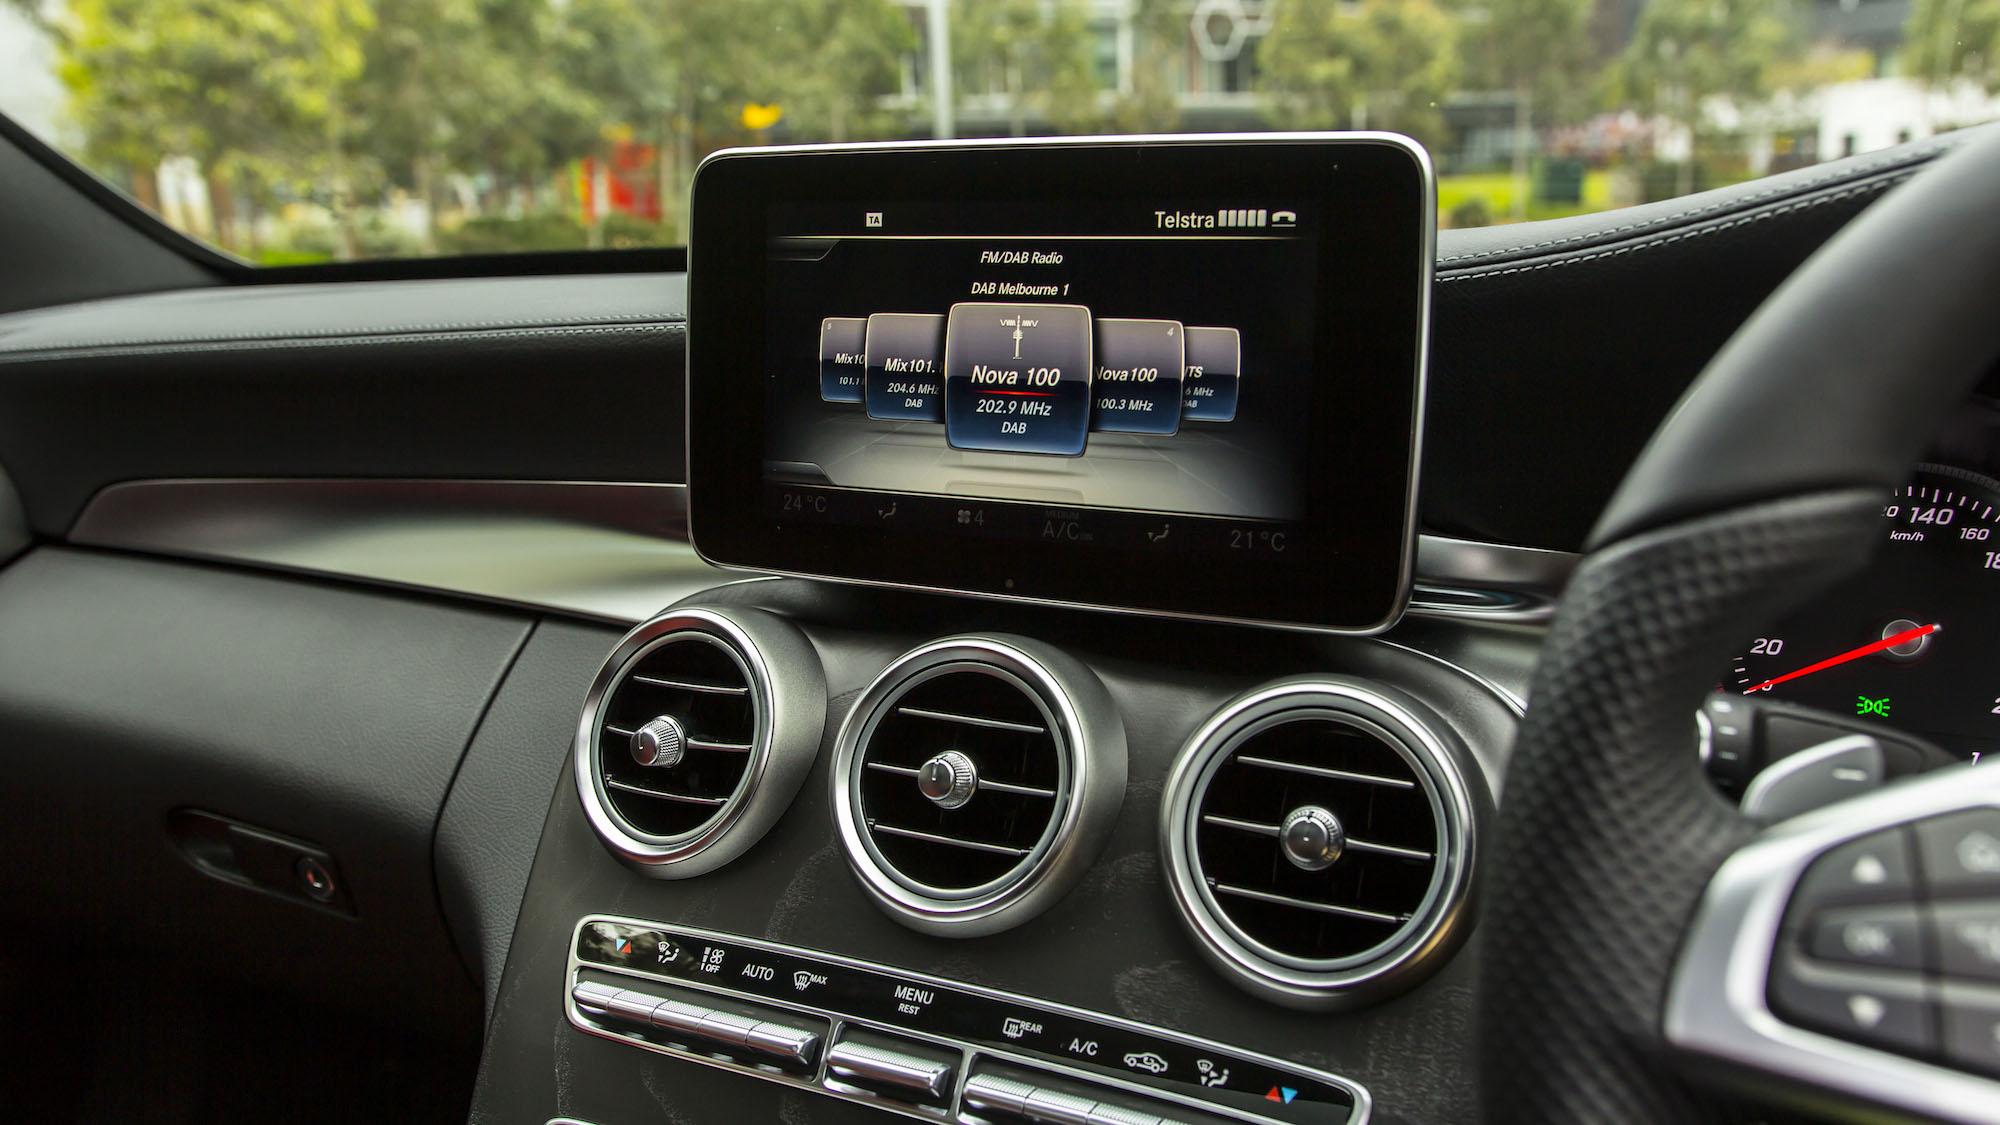 2015 Toyota Suv >> 2015 Mercedes-Benz C250 Review - photos | CarAdvice